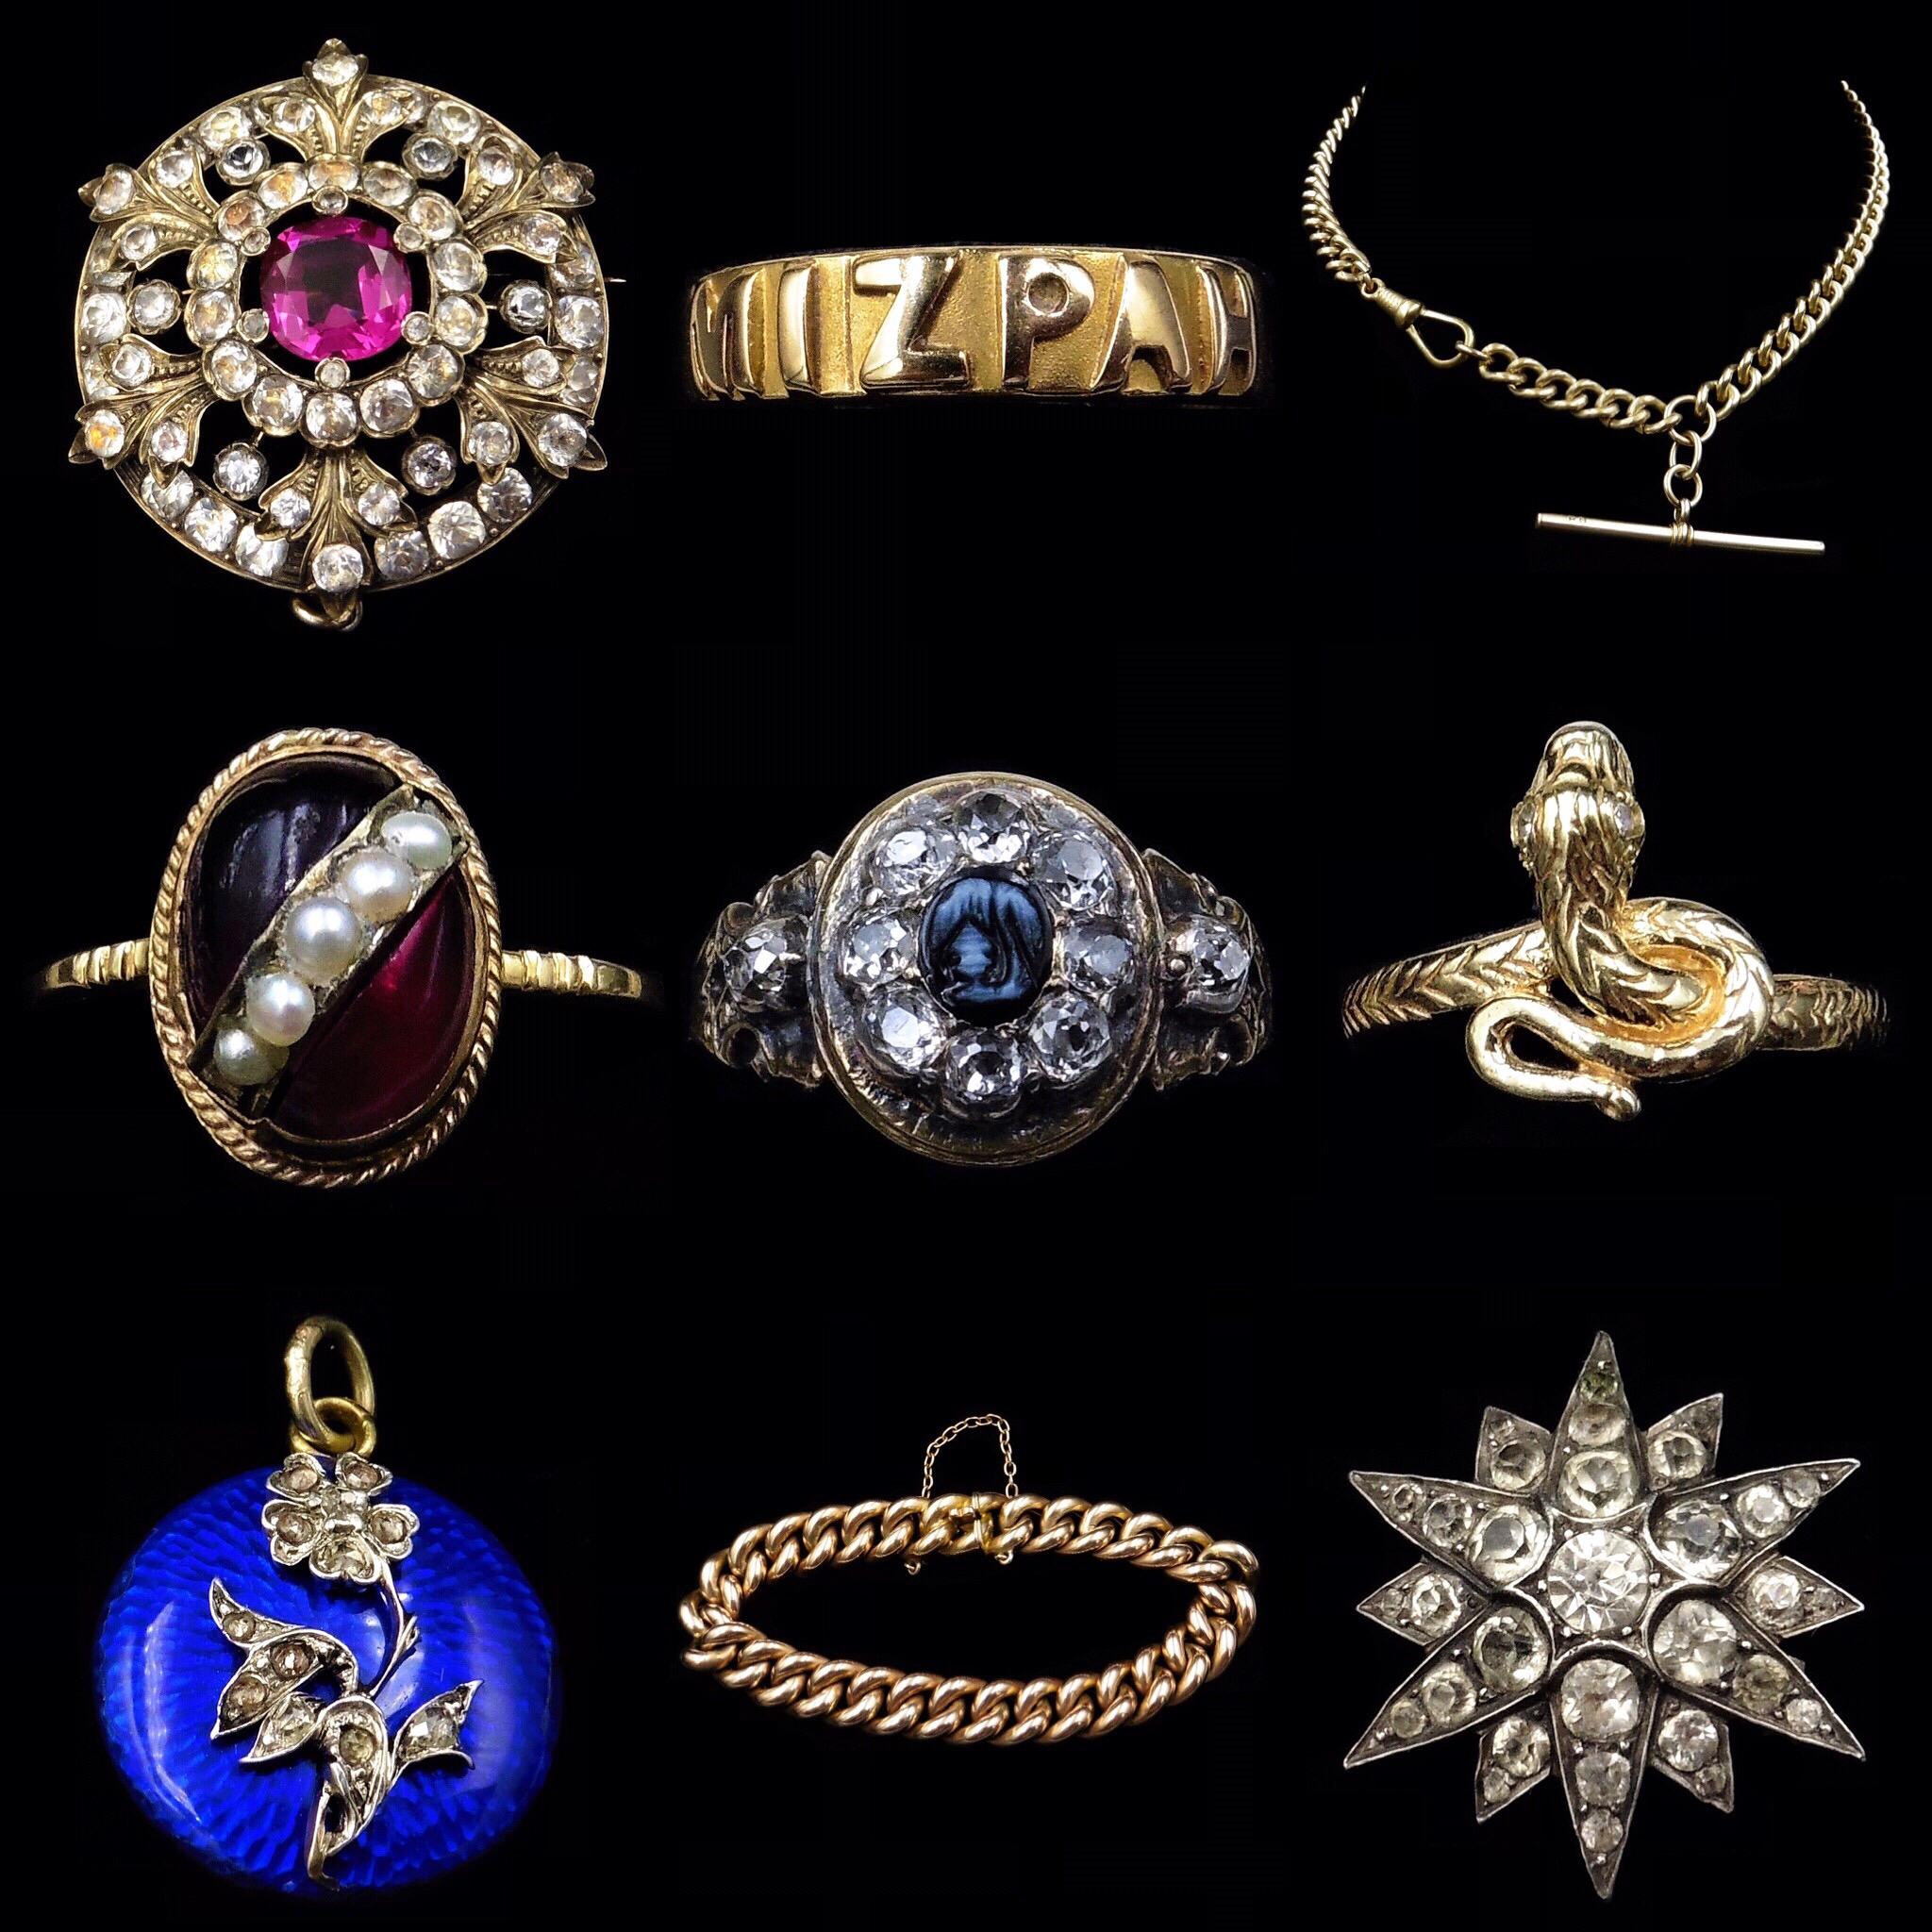 Lancastrian Jewellers image (6 of 6)